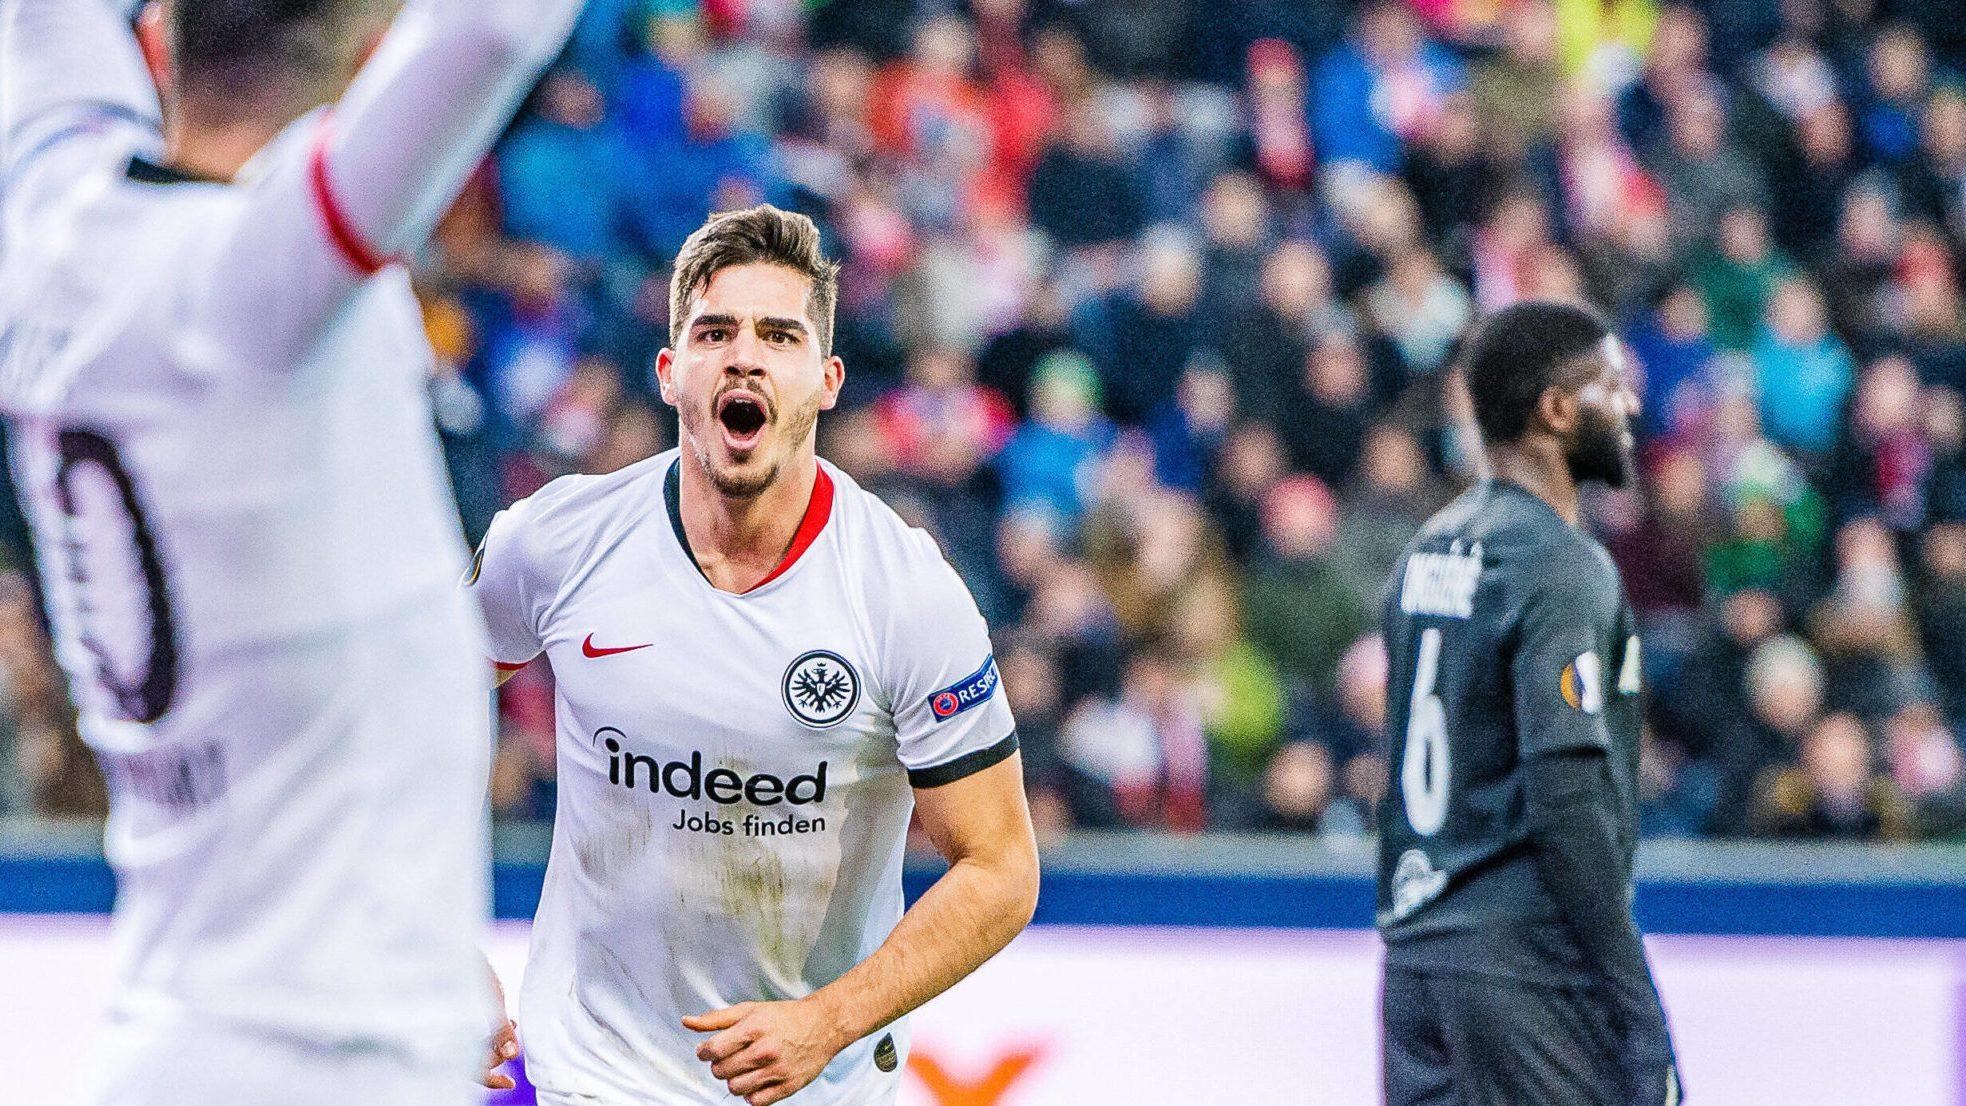 Bundesliga Andre Silva Brace Enures Eintracht Frankfurt Overcome Red Bull Salzburg To Reach Uefa Europa League Last 16